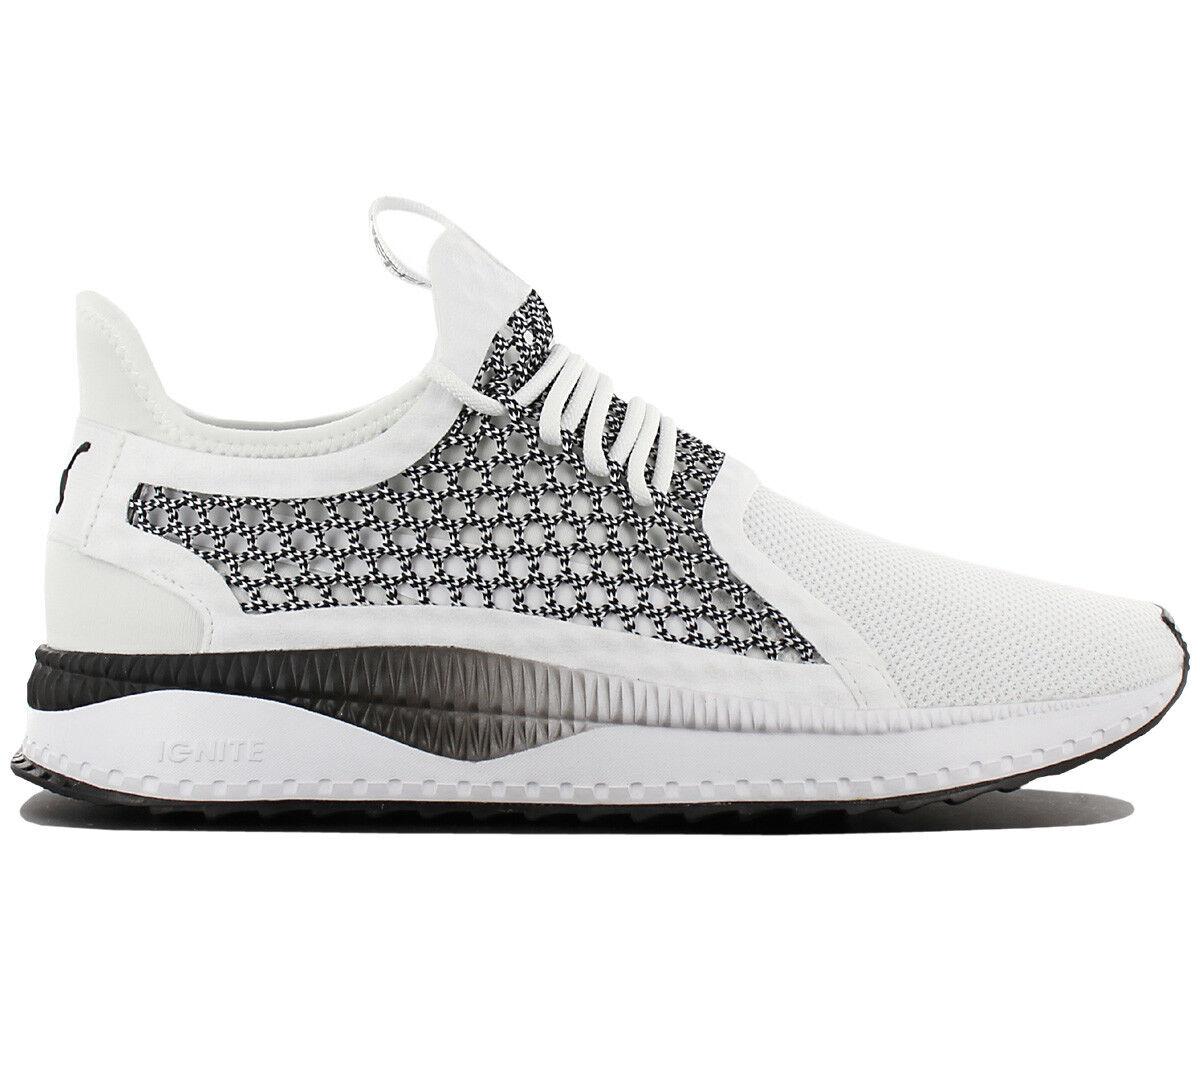 Puma Tsugi Netfit V2 Ignite Sneaker Scarpe Uomo Sneaker 365398-01 Scarpa Sport